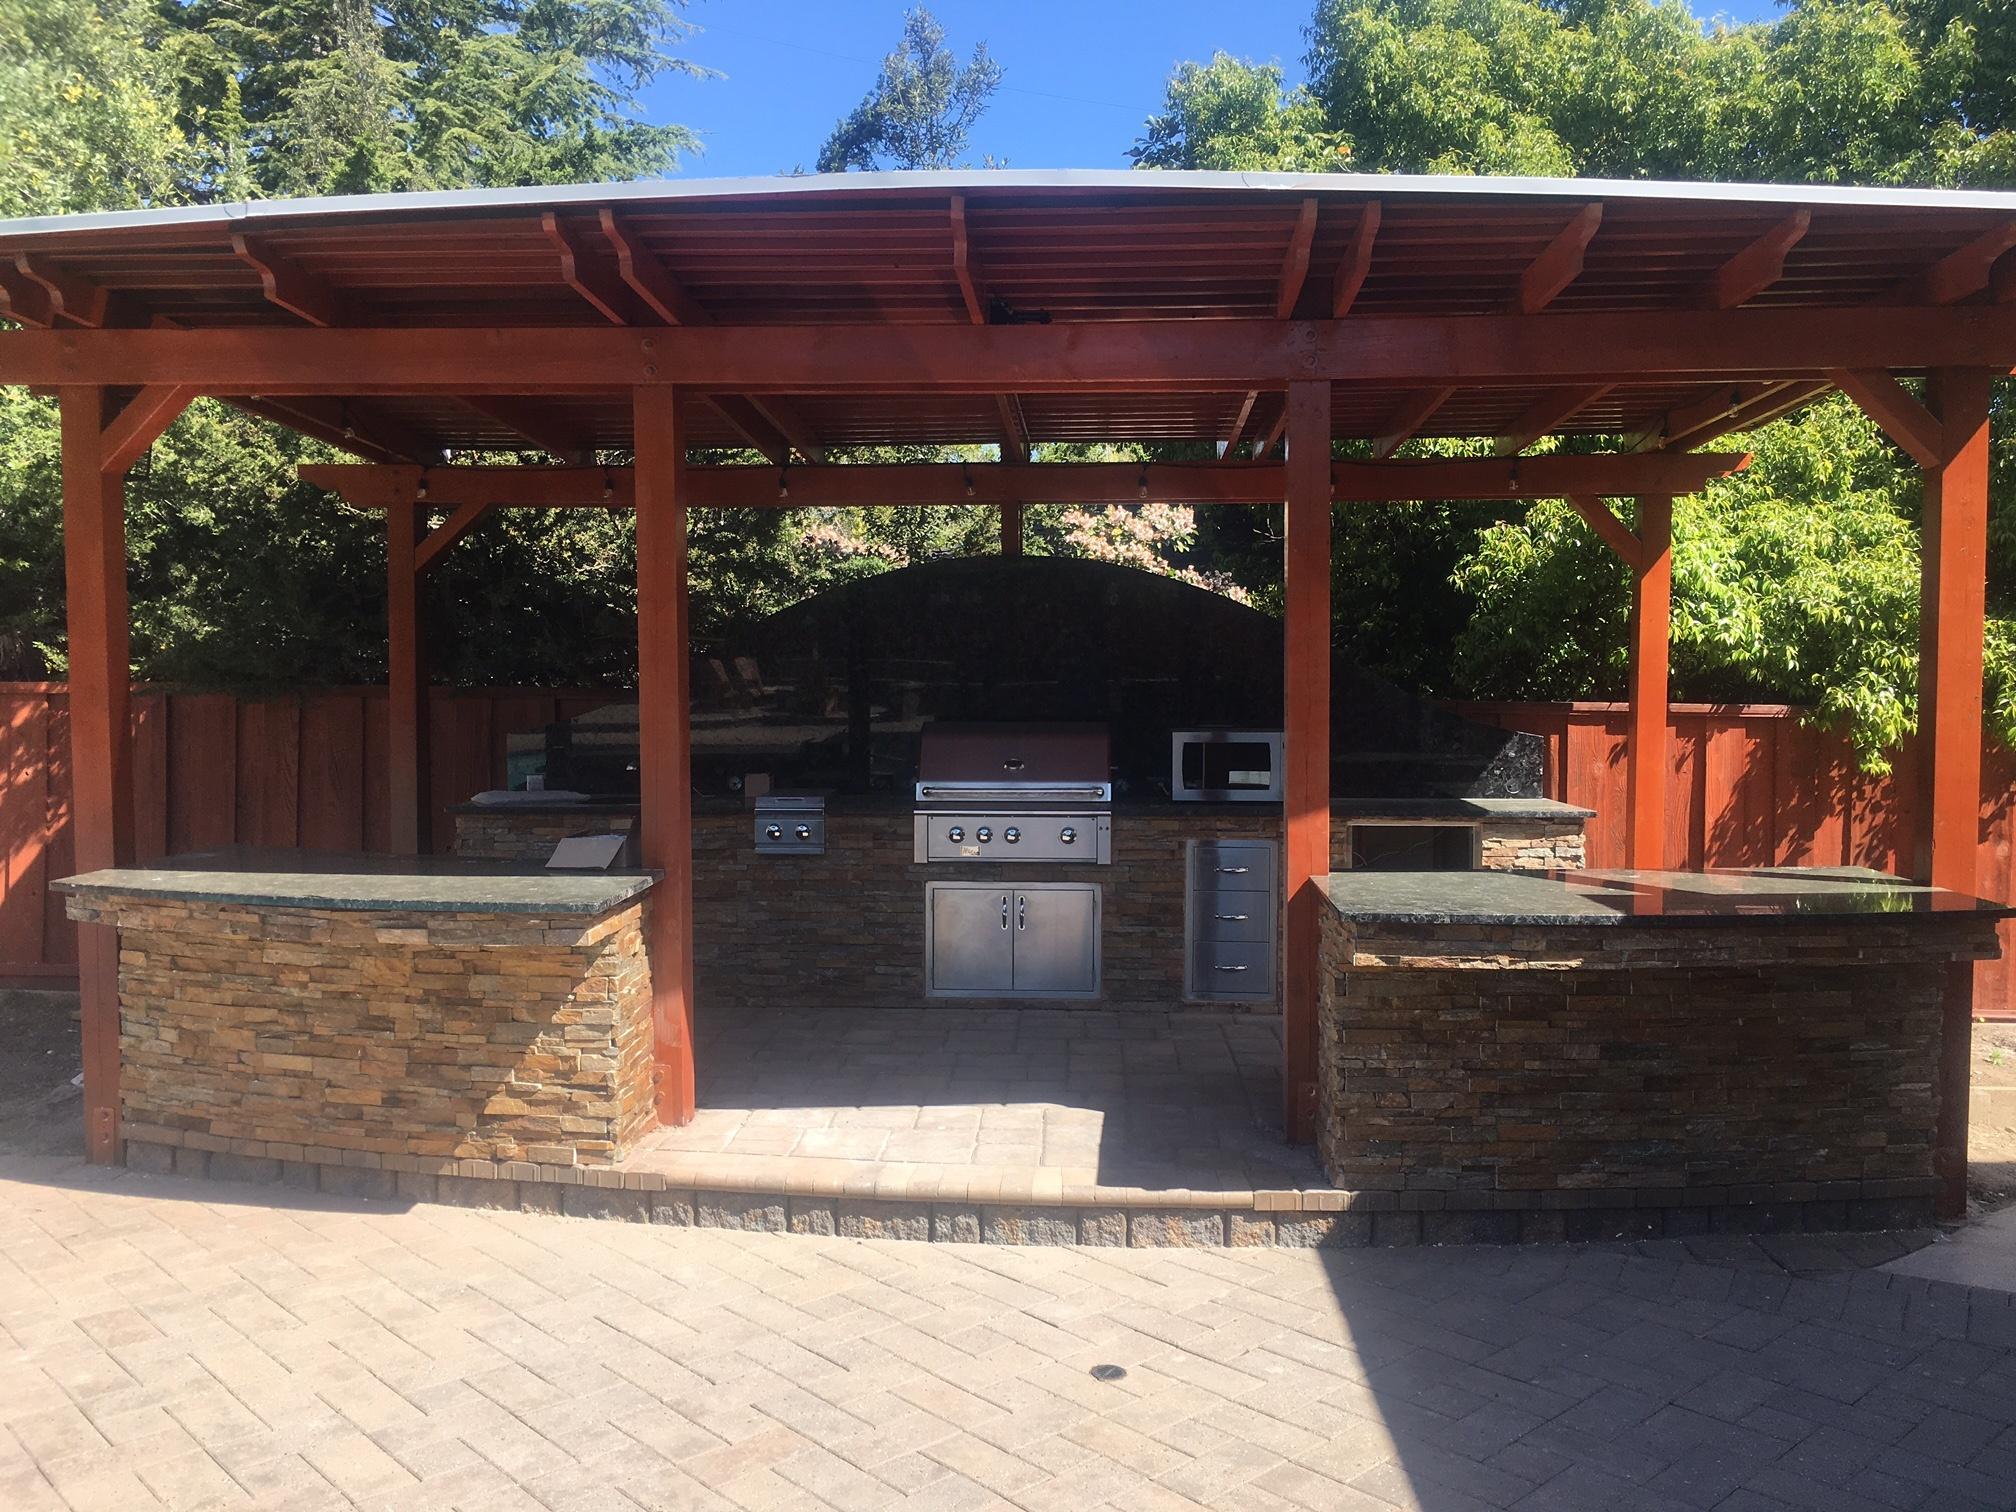 06-Goal Pergola and Outdoor Kitchen - Saratoga, CA-1.jpg